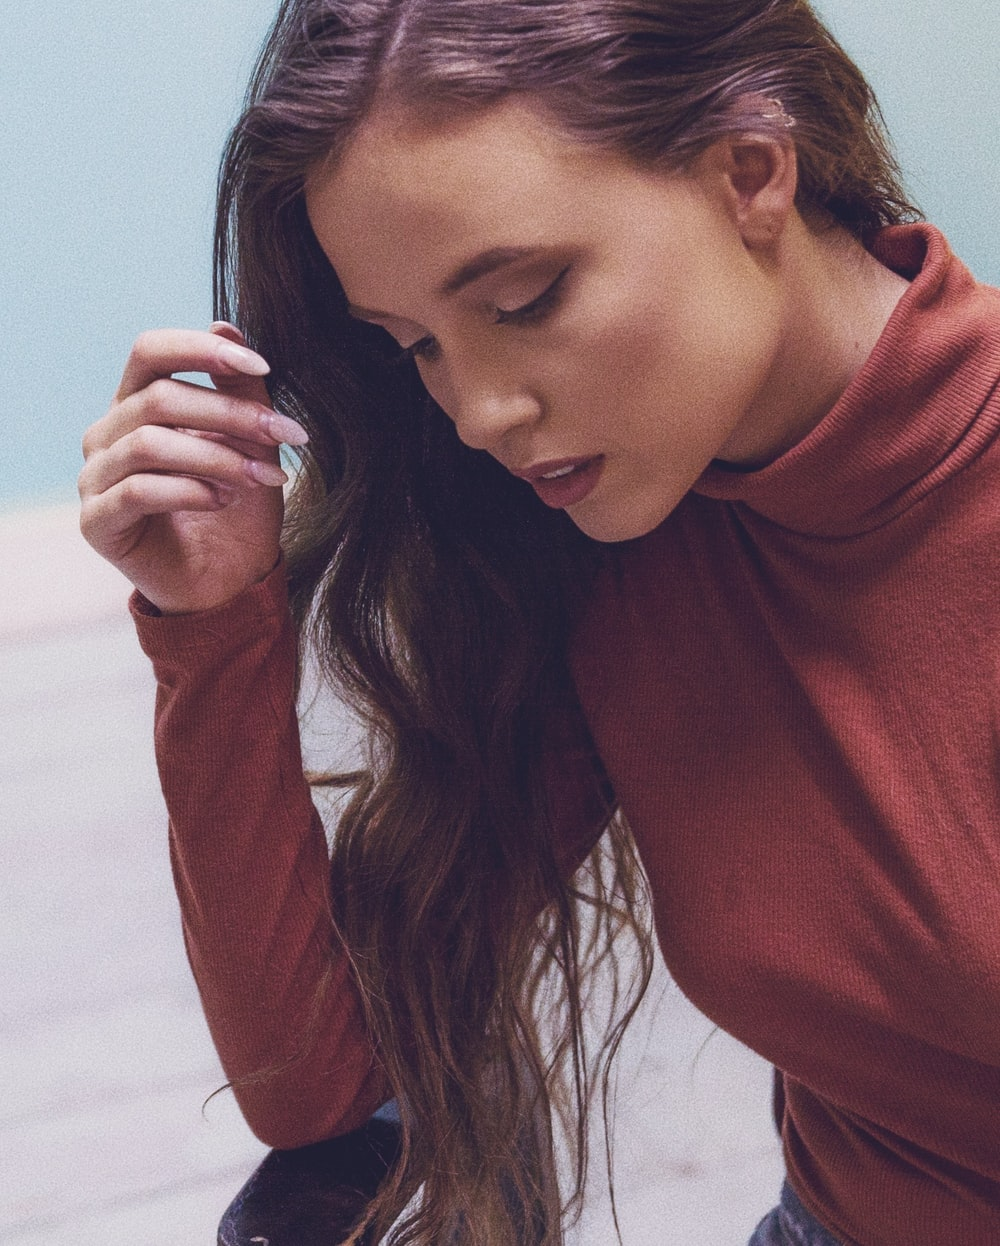 woman wearing maroon top